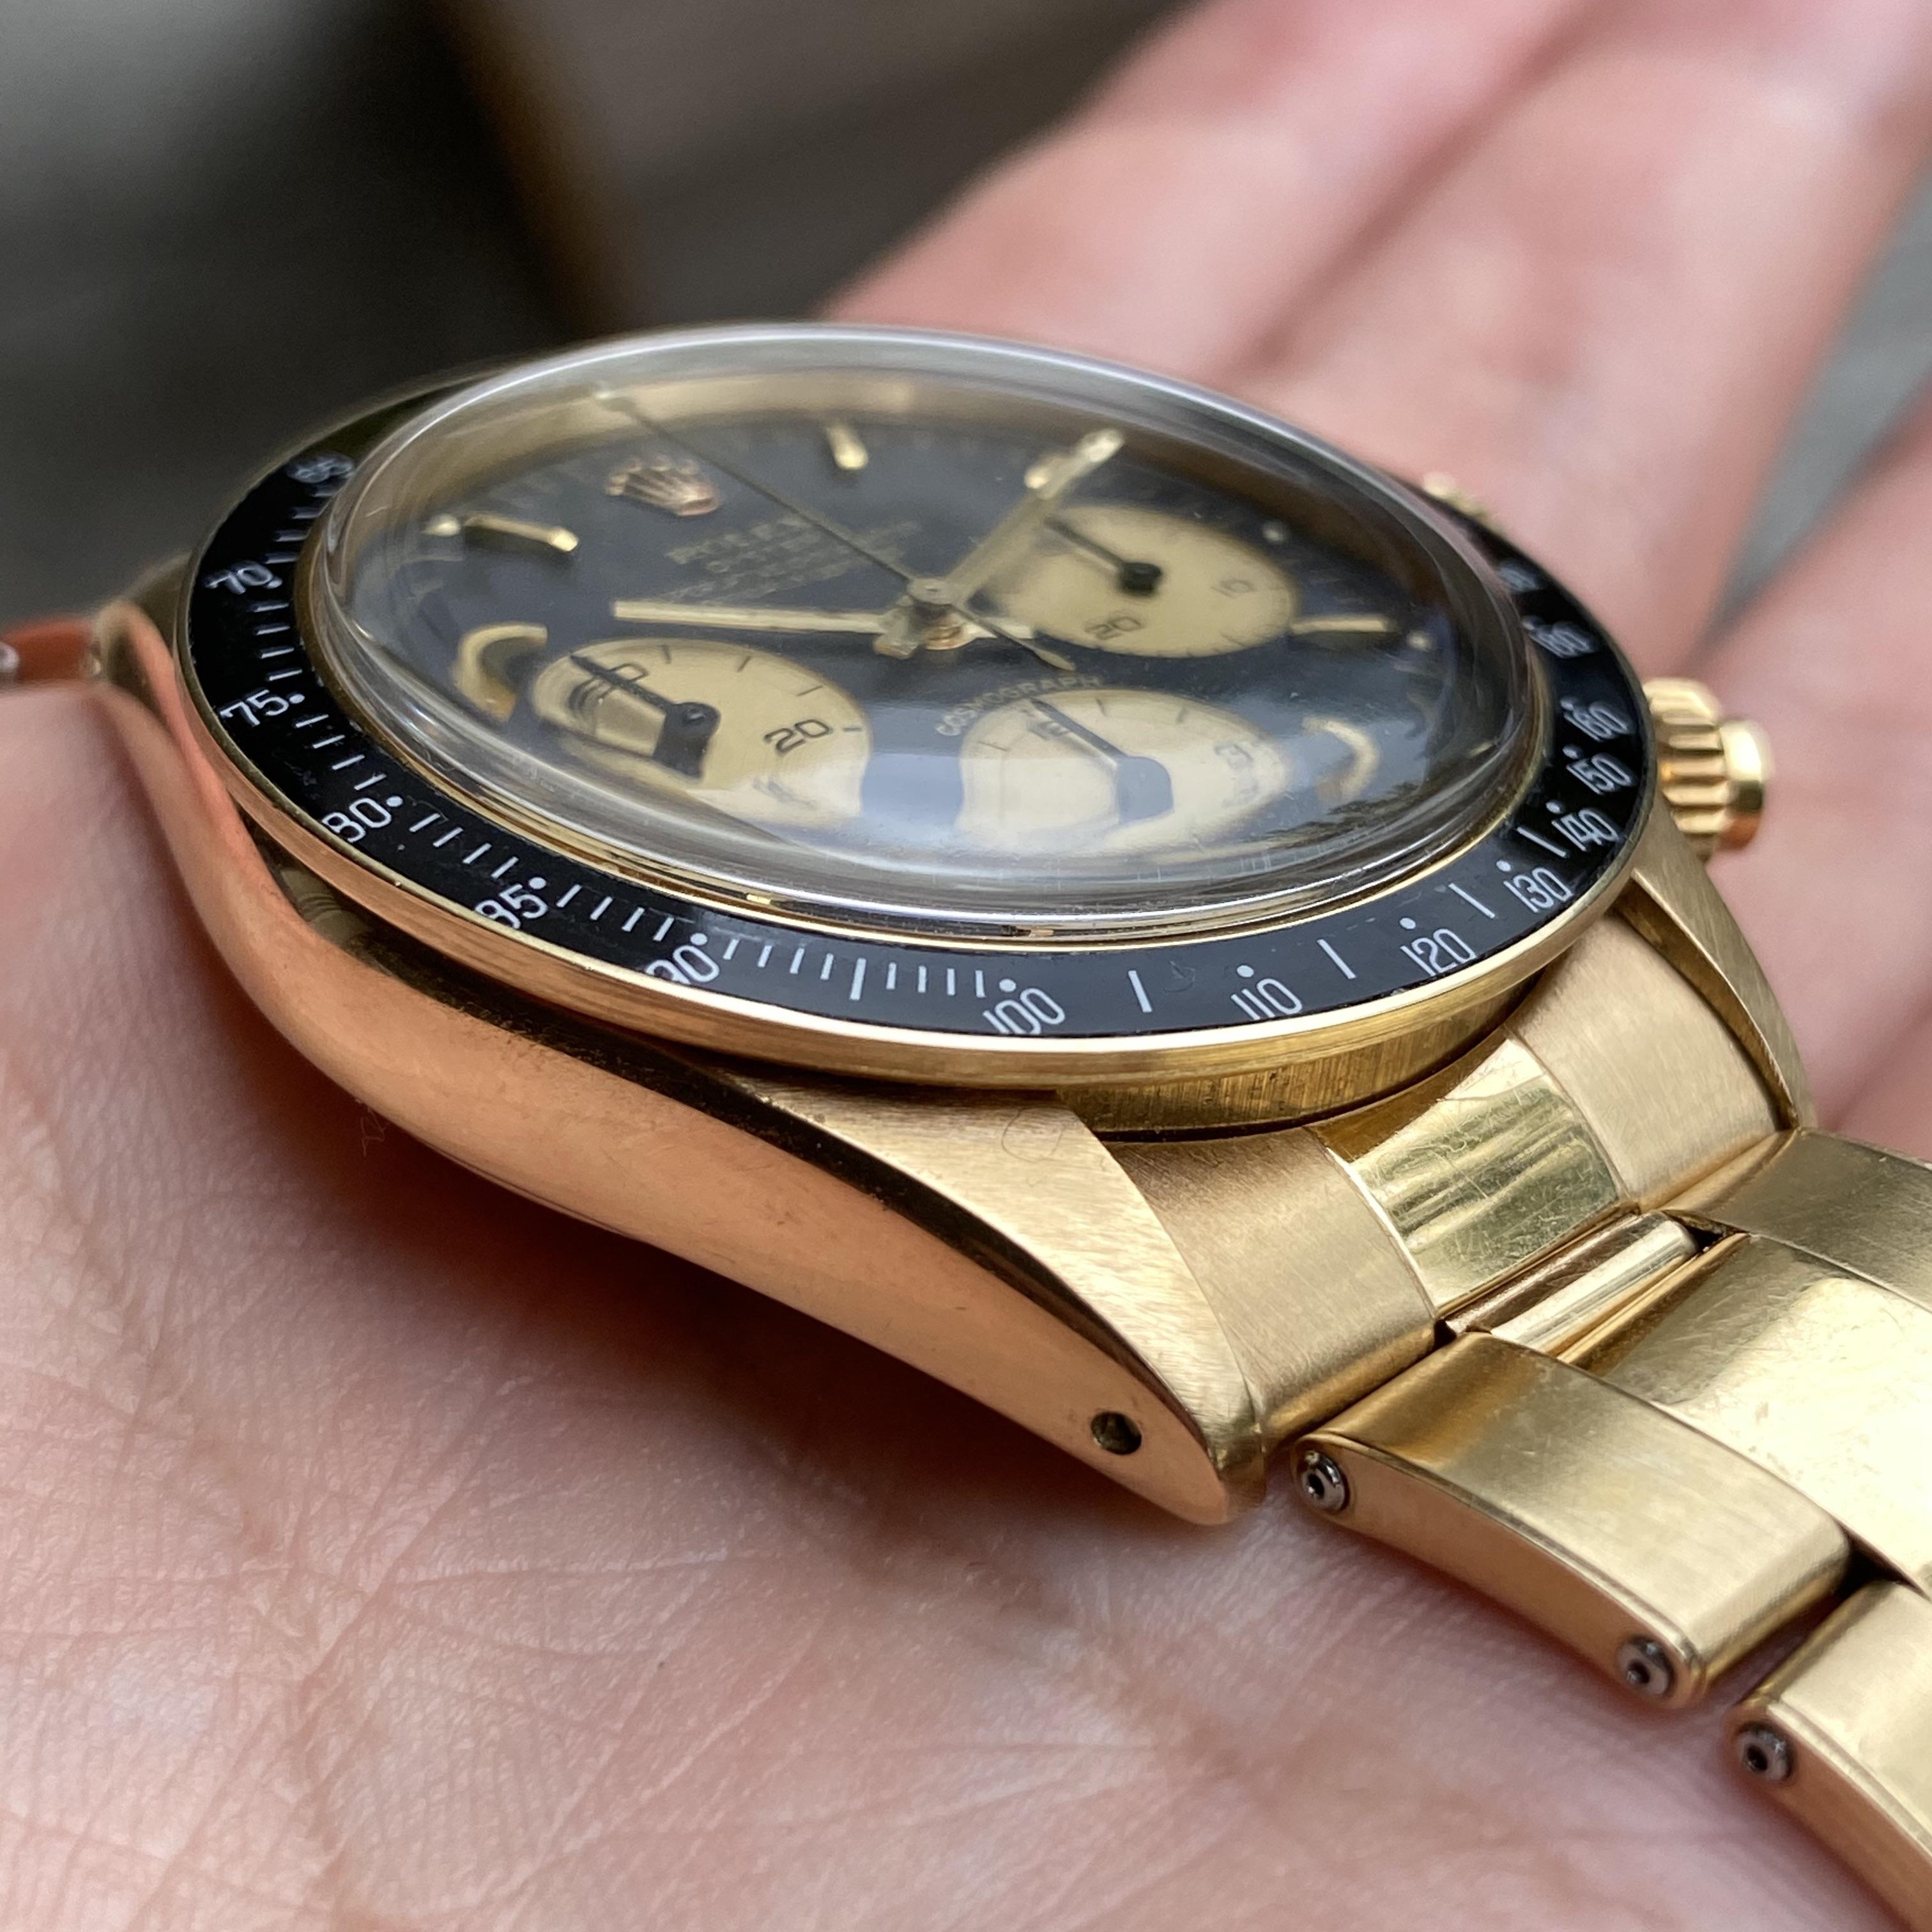 Rolex 6263 14K big eyes 1976 #status : sold